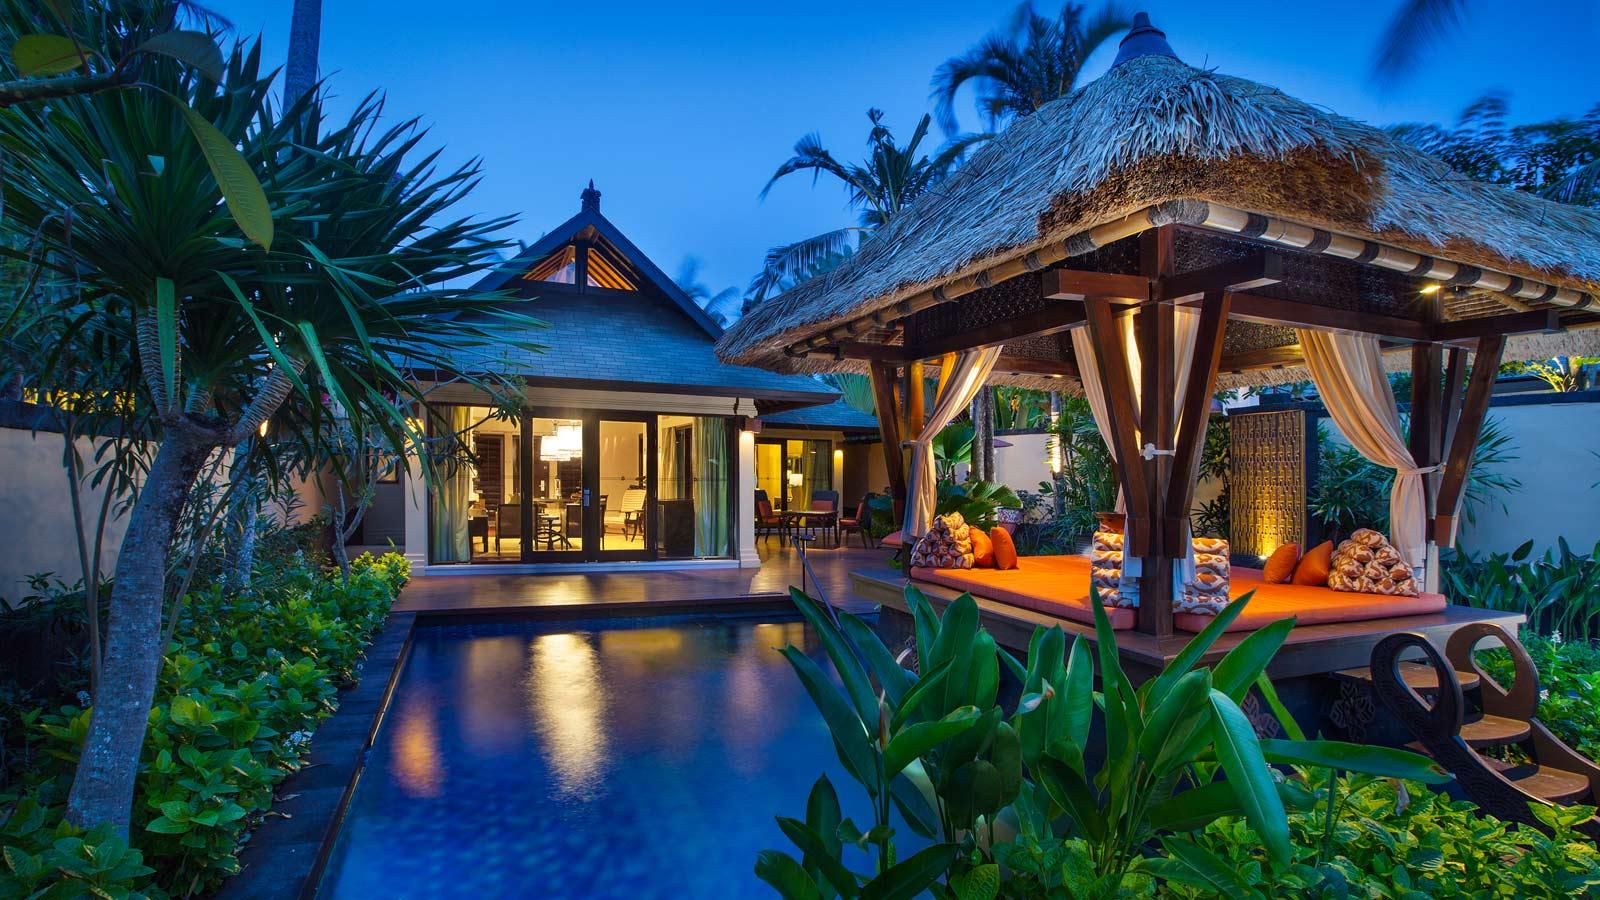 St. Regis Bali Hotel